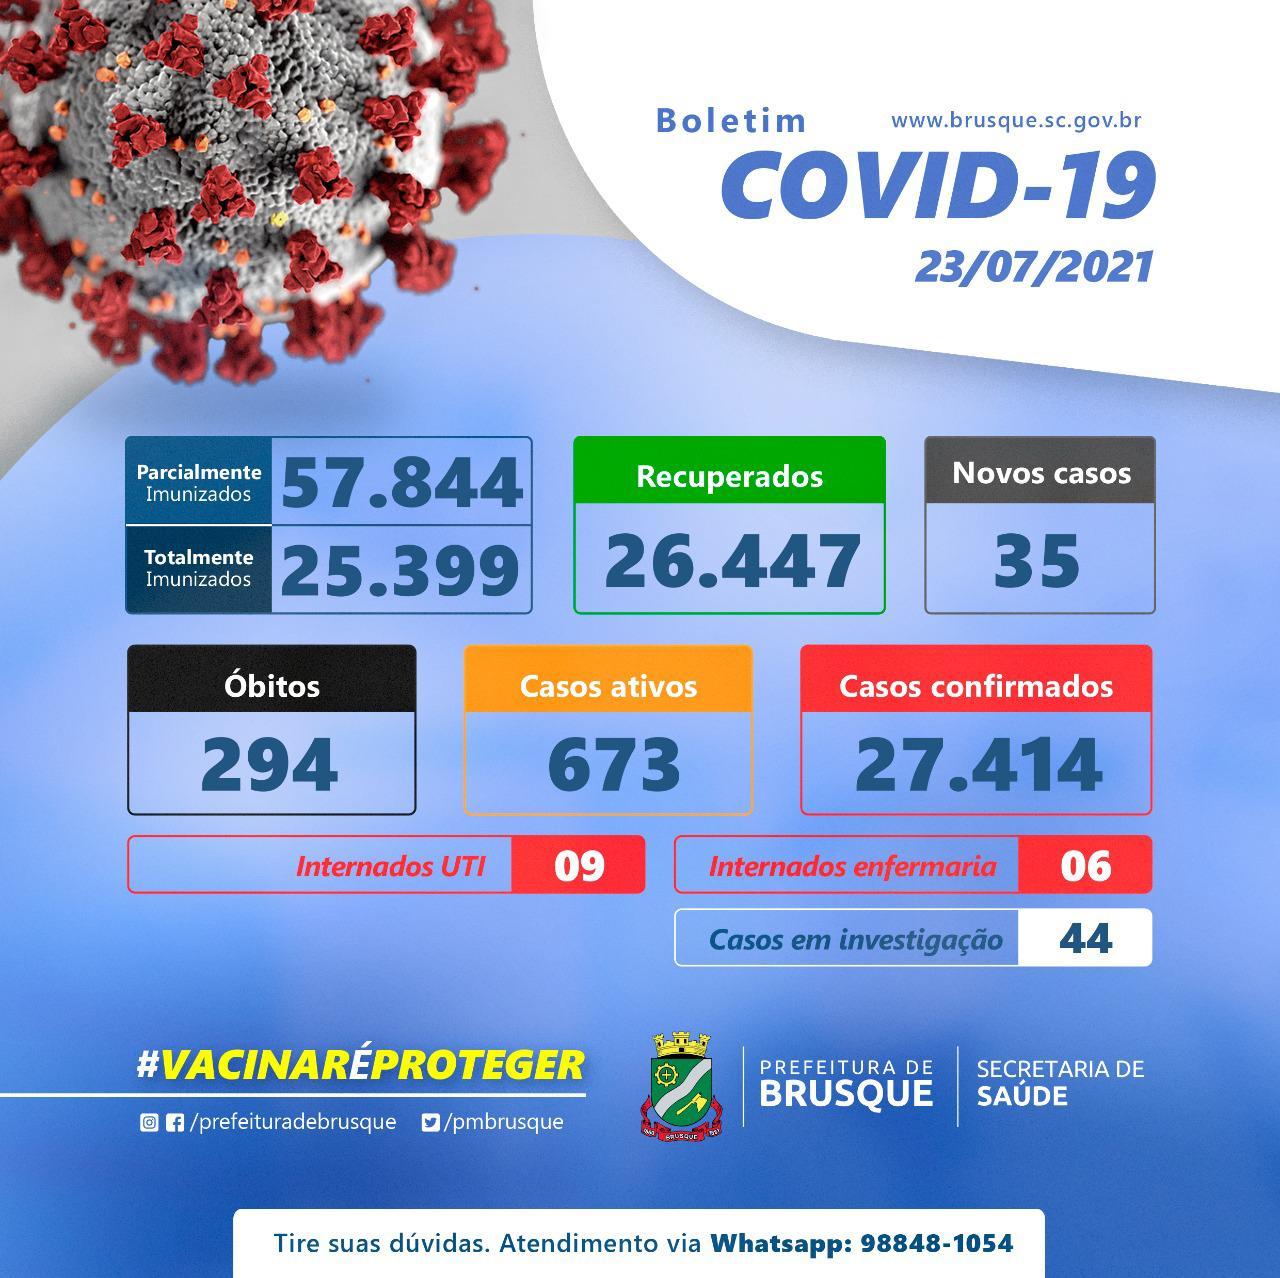 Covid-19: Confira o boletim epidemiológico desta sexta-feira (23)